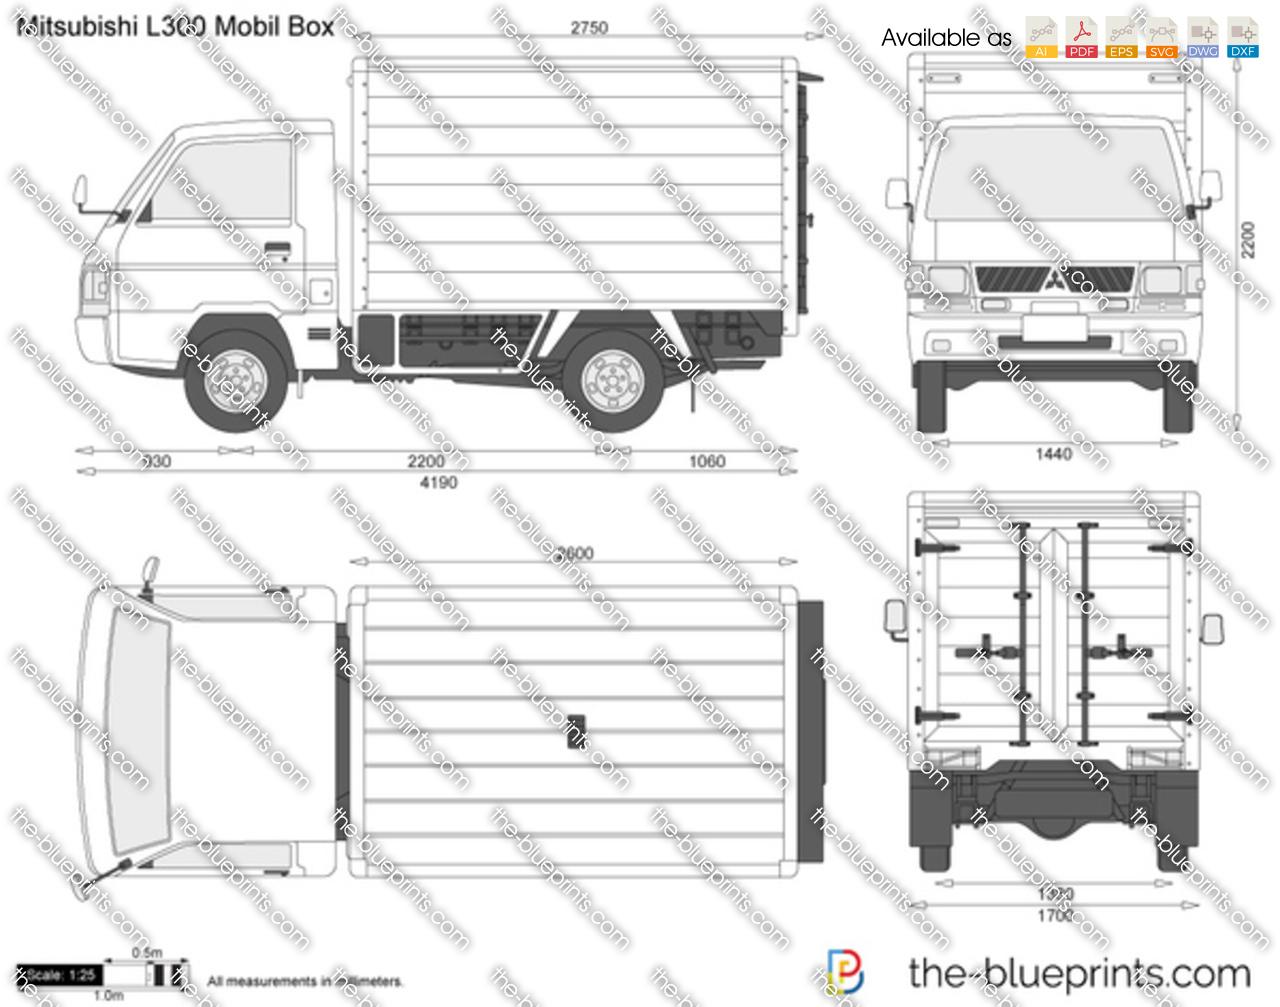 Mitsubishi L300 Mobil Box 2000